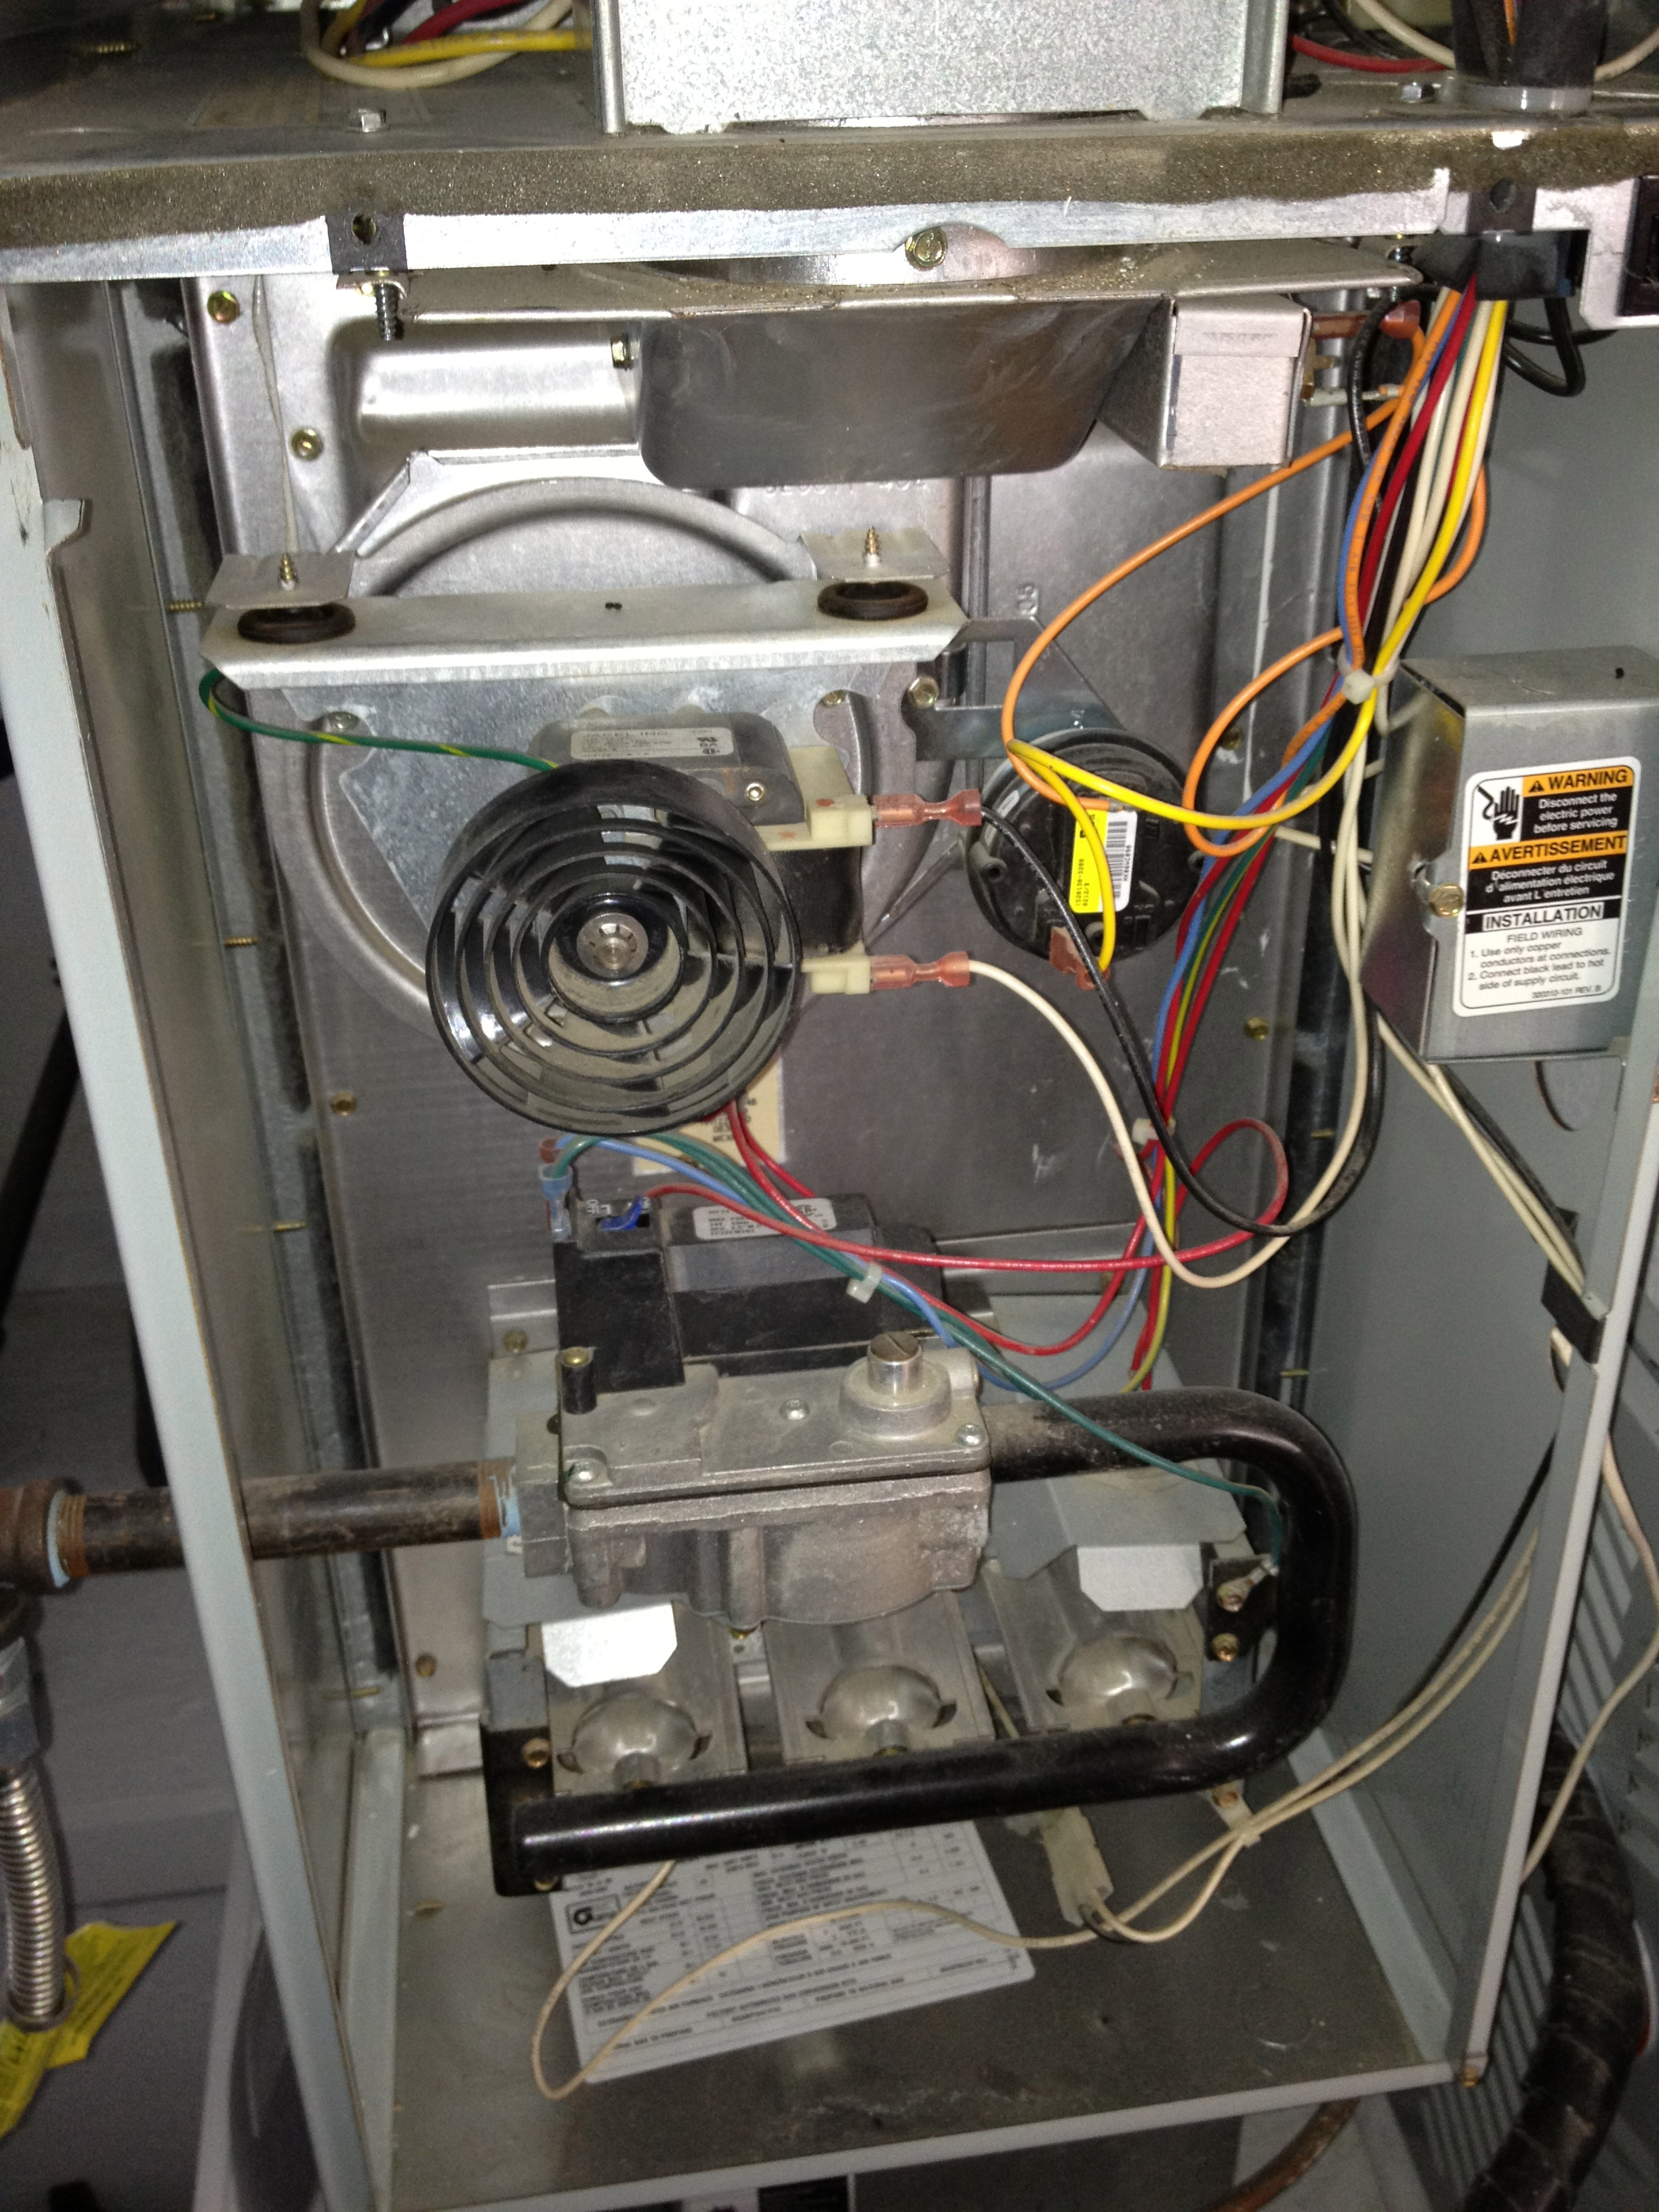 Payne Gas Heater Wiring Diagram Get Free Image About Wiring Diagram